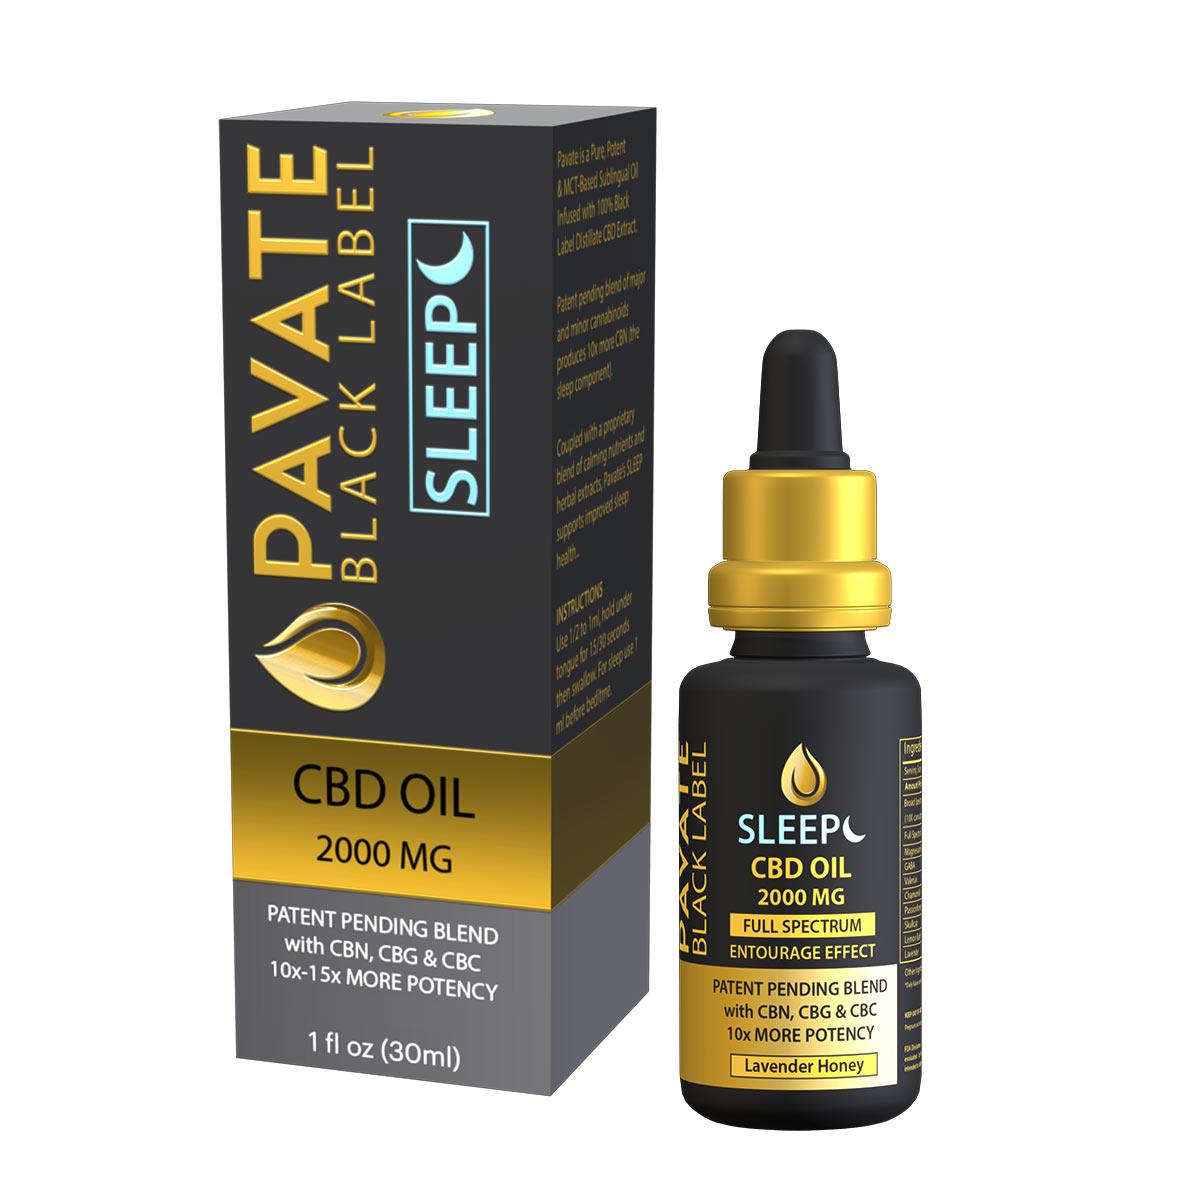 pavate-black-label-sleep-cbd-tincture-2000mg-bottle+box